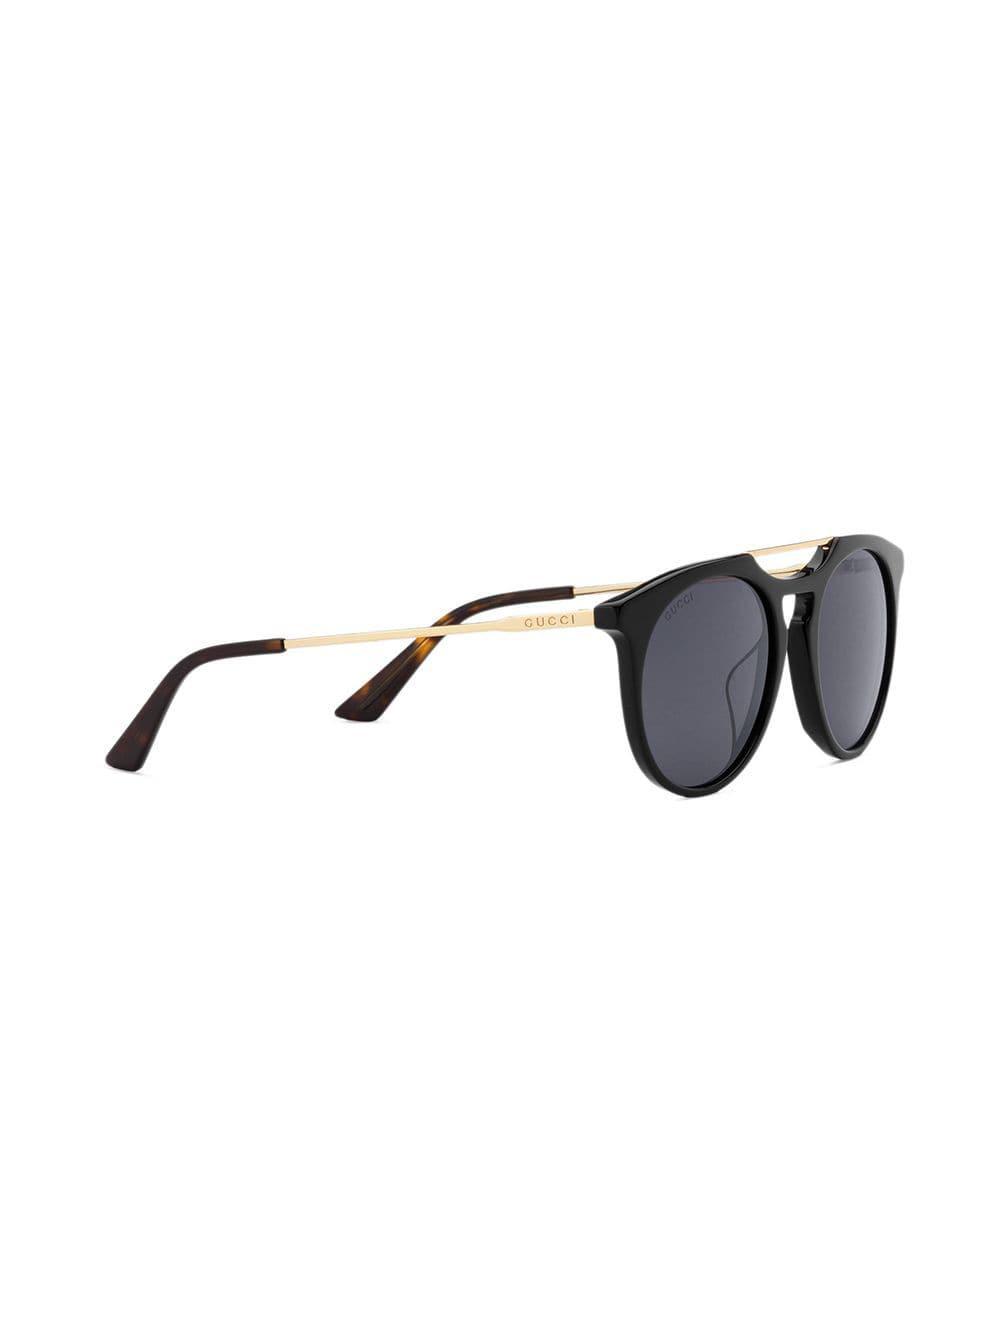 cc5bc8c2fd0 Lyst - Gucci Round-frame Acetate Sunglasses in Black for Men